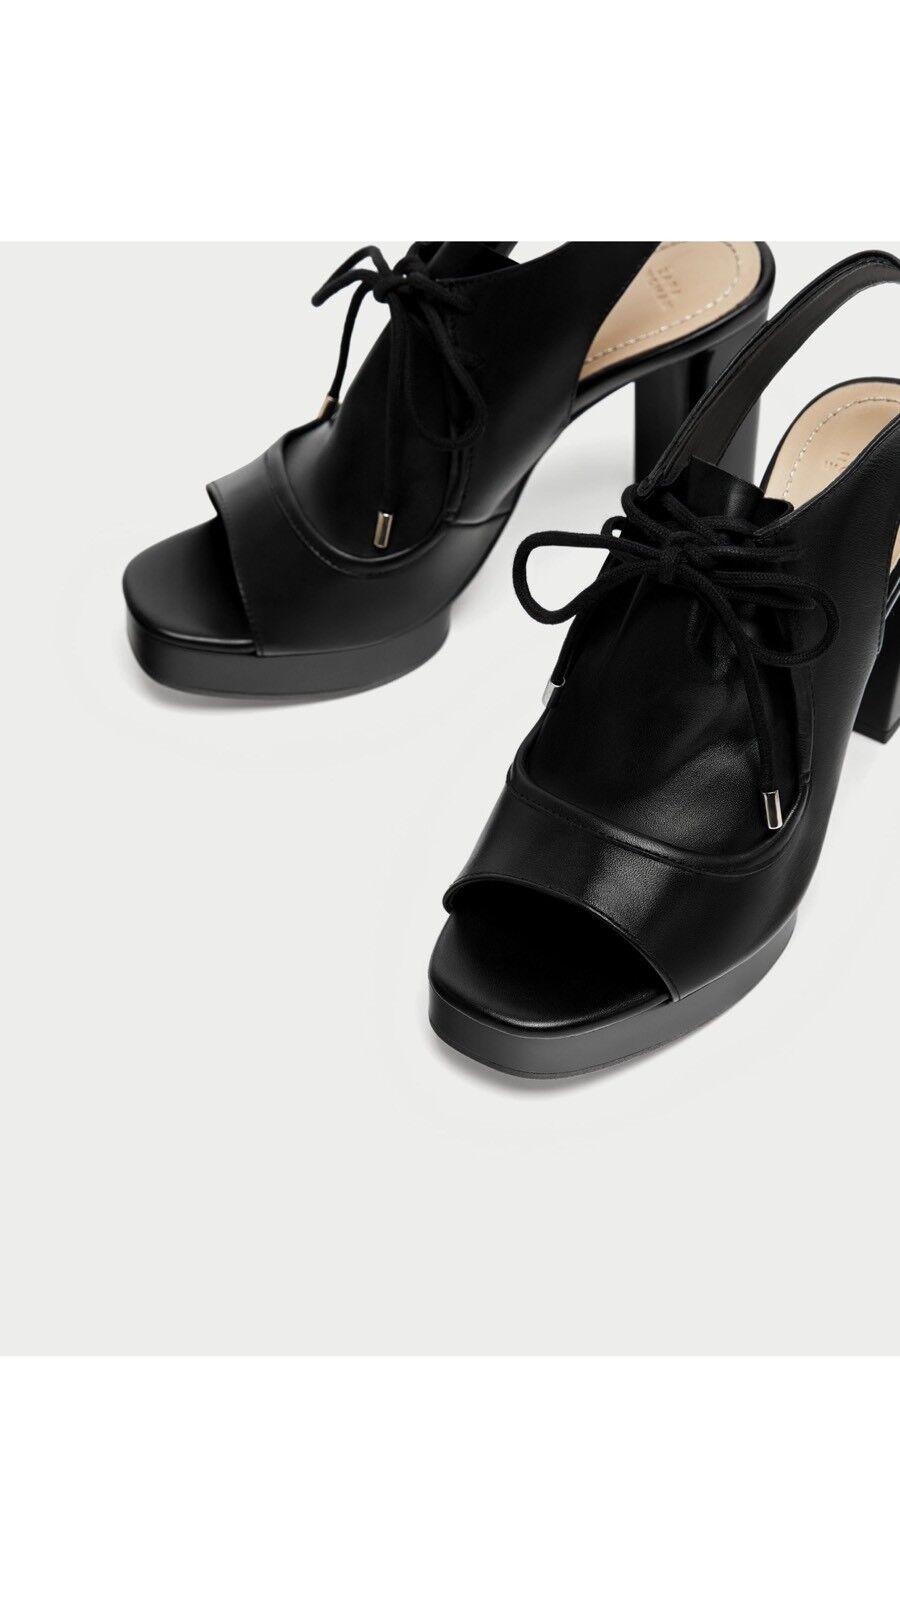 NWT ZARA US Buckled Leather Slingback Sandal US ZARA 6.5 EU 37 c4a2ee